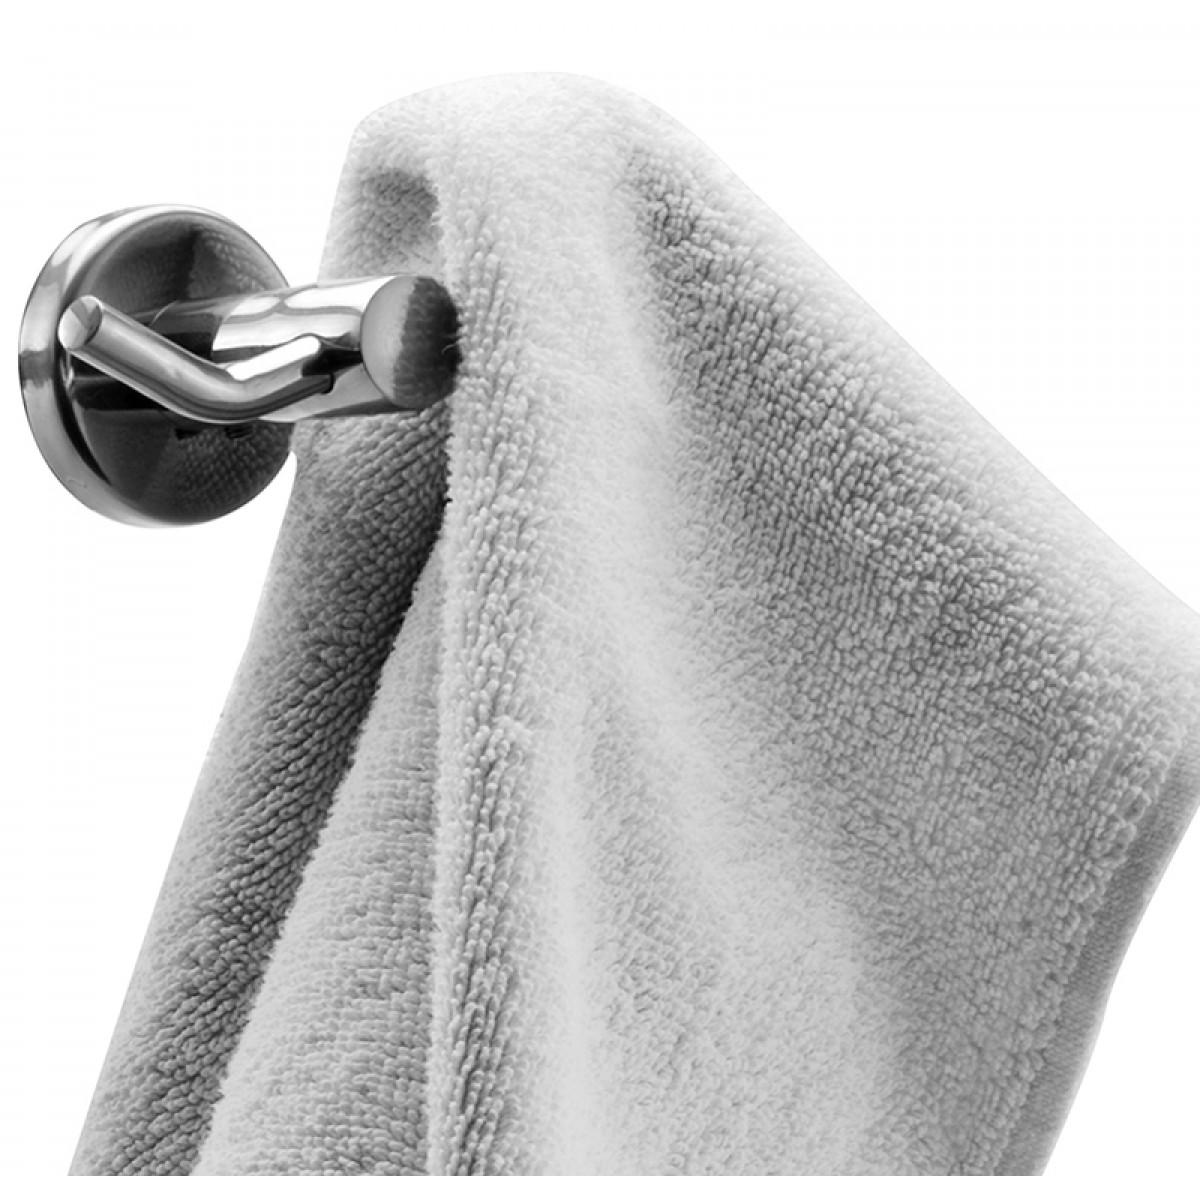 Klaxon Krysil Stainless Steel Bath Robe Hook Silver Chrome Finish Robe Hook Bathroom